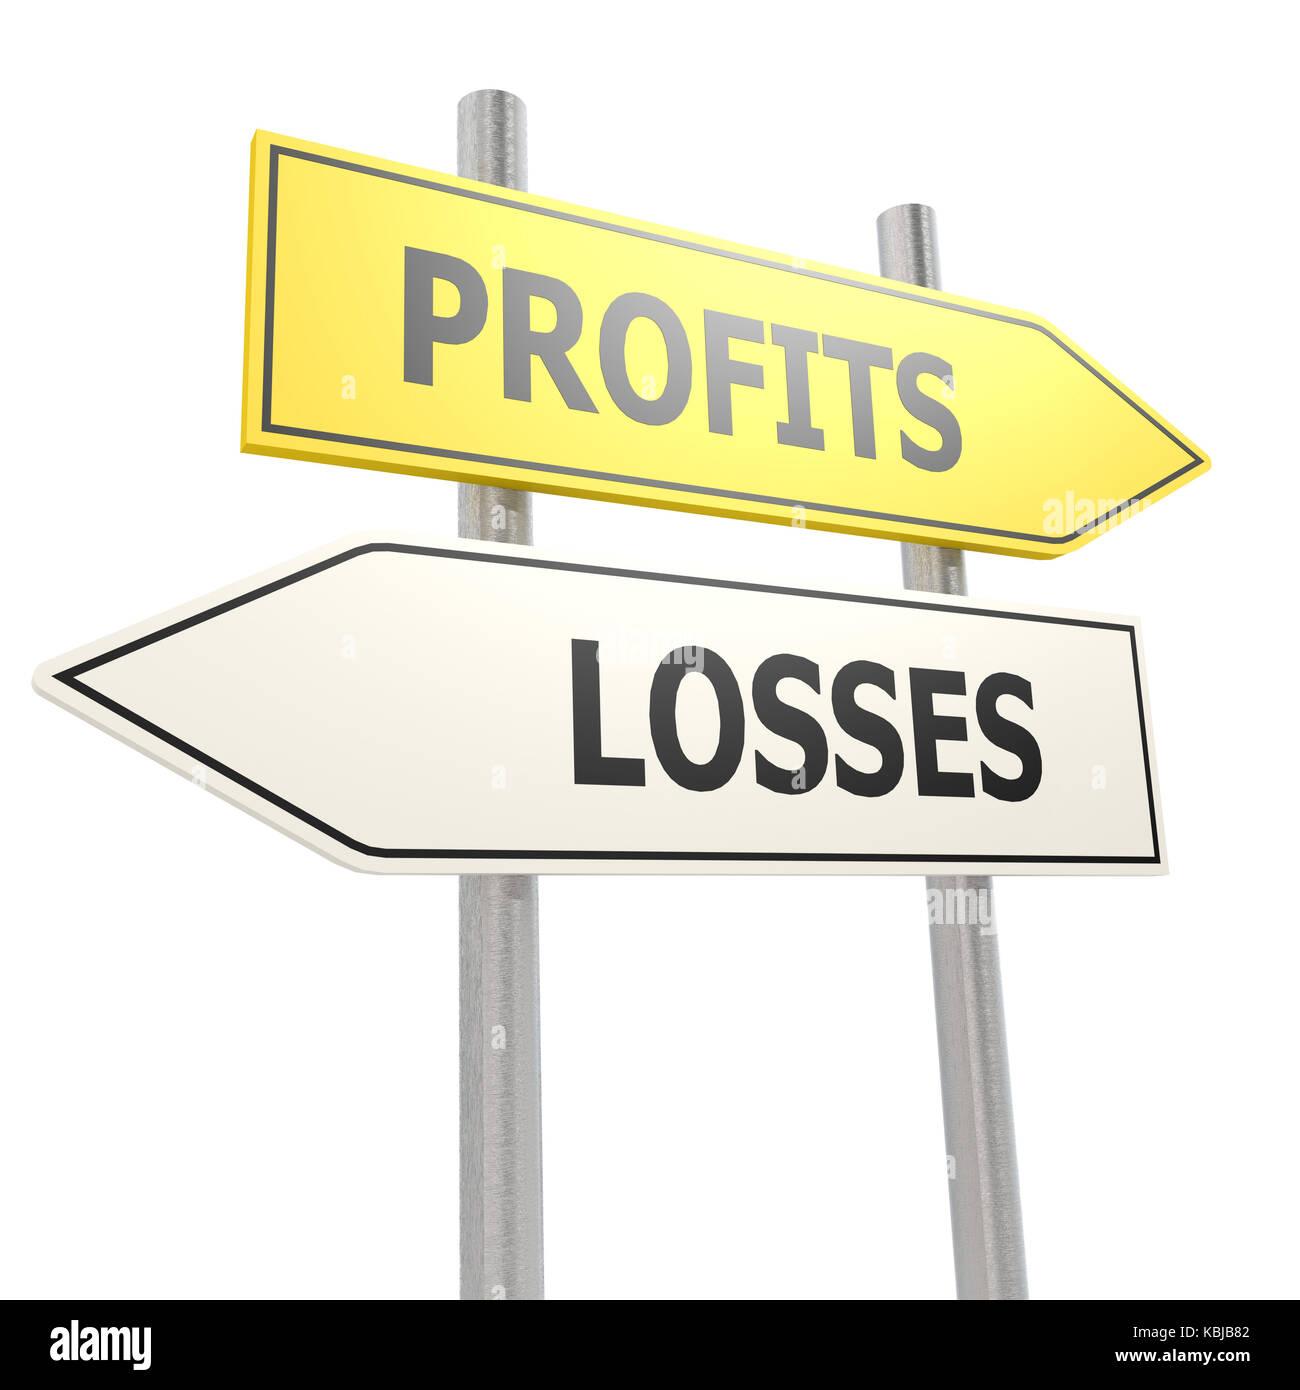 Profits losses road sign - Stock Image